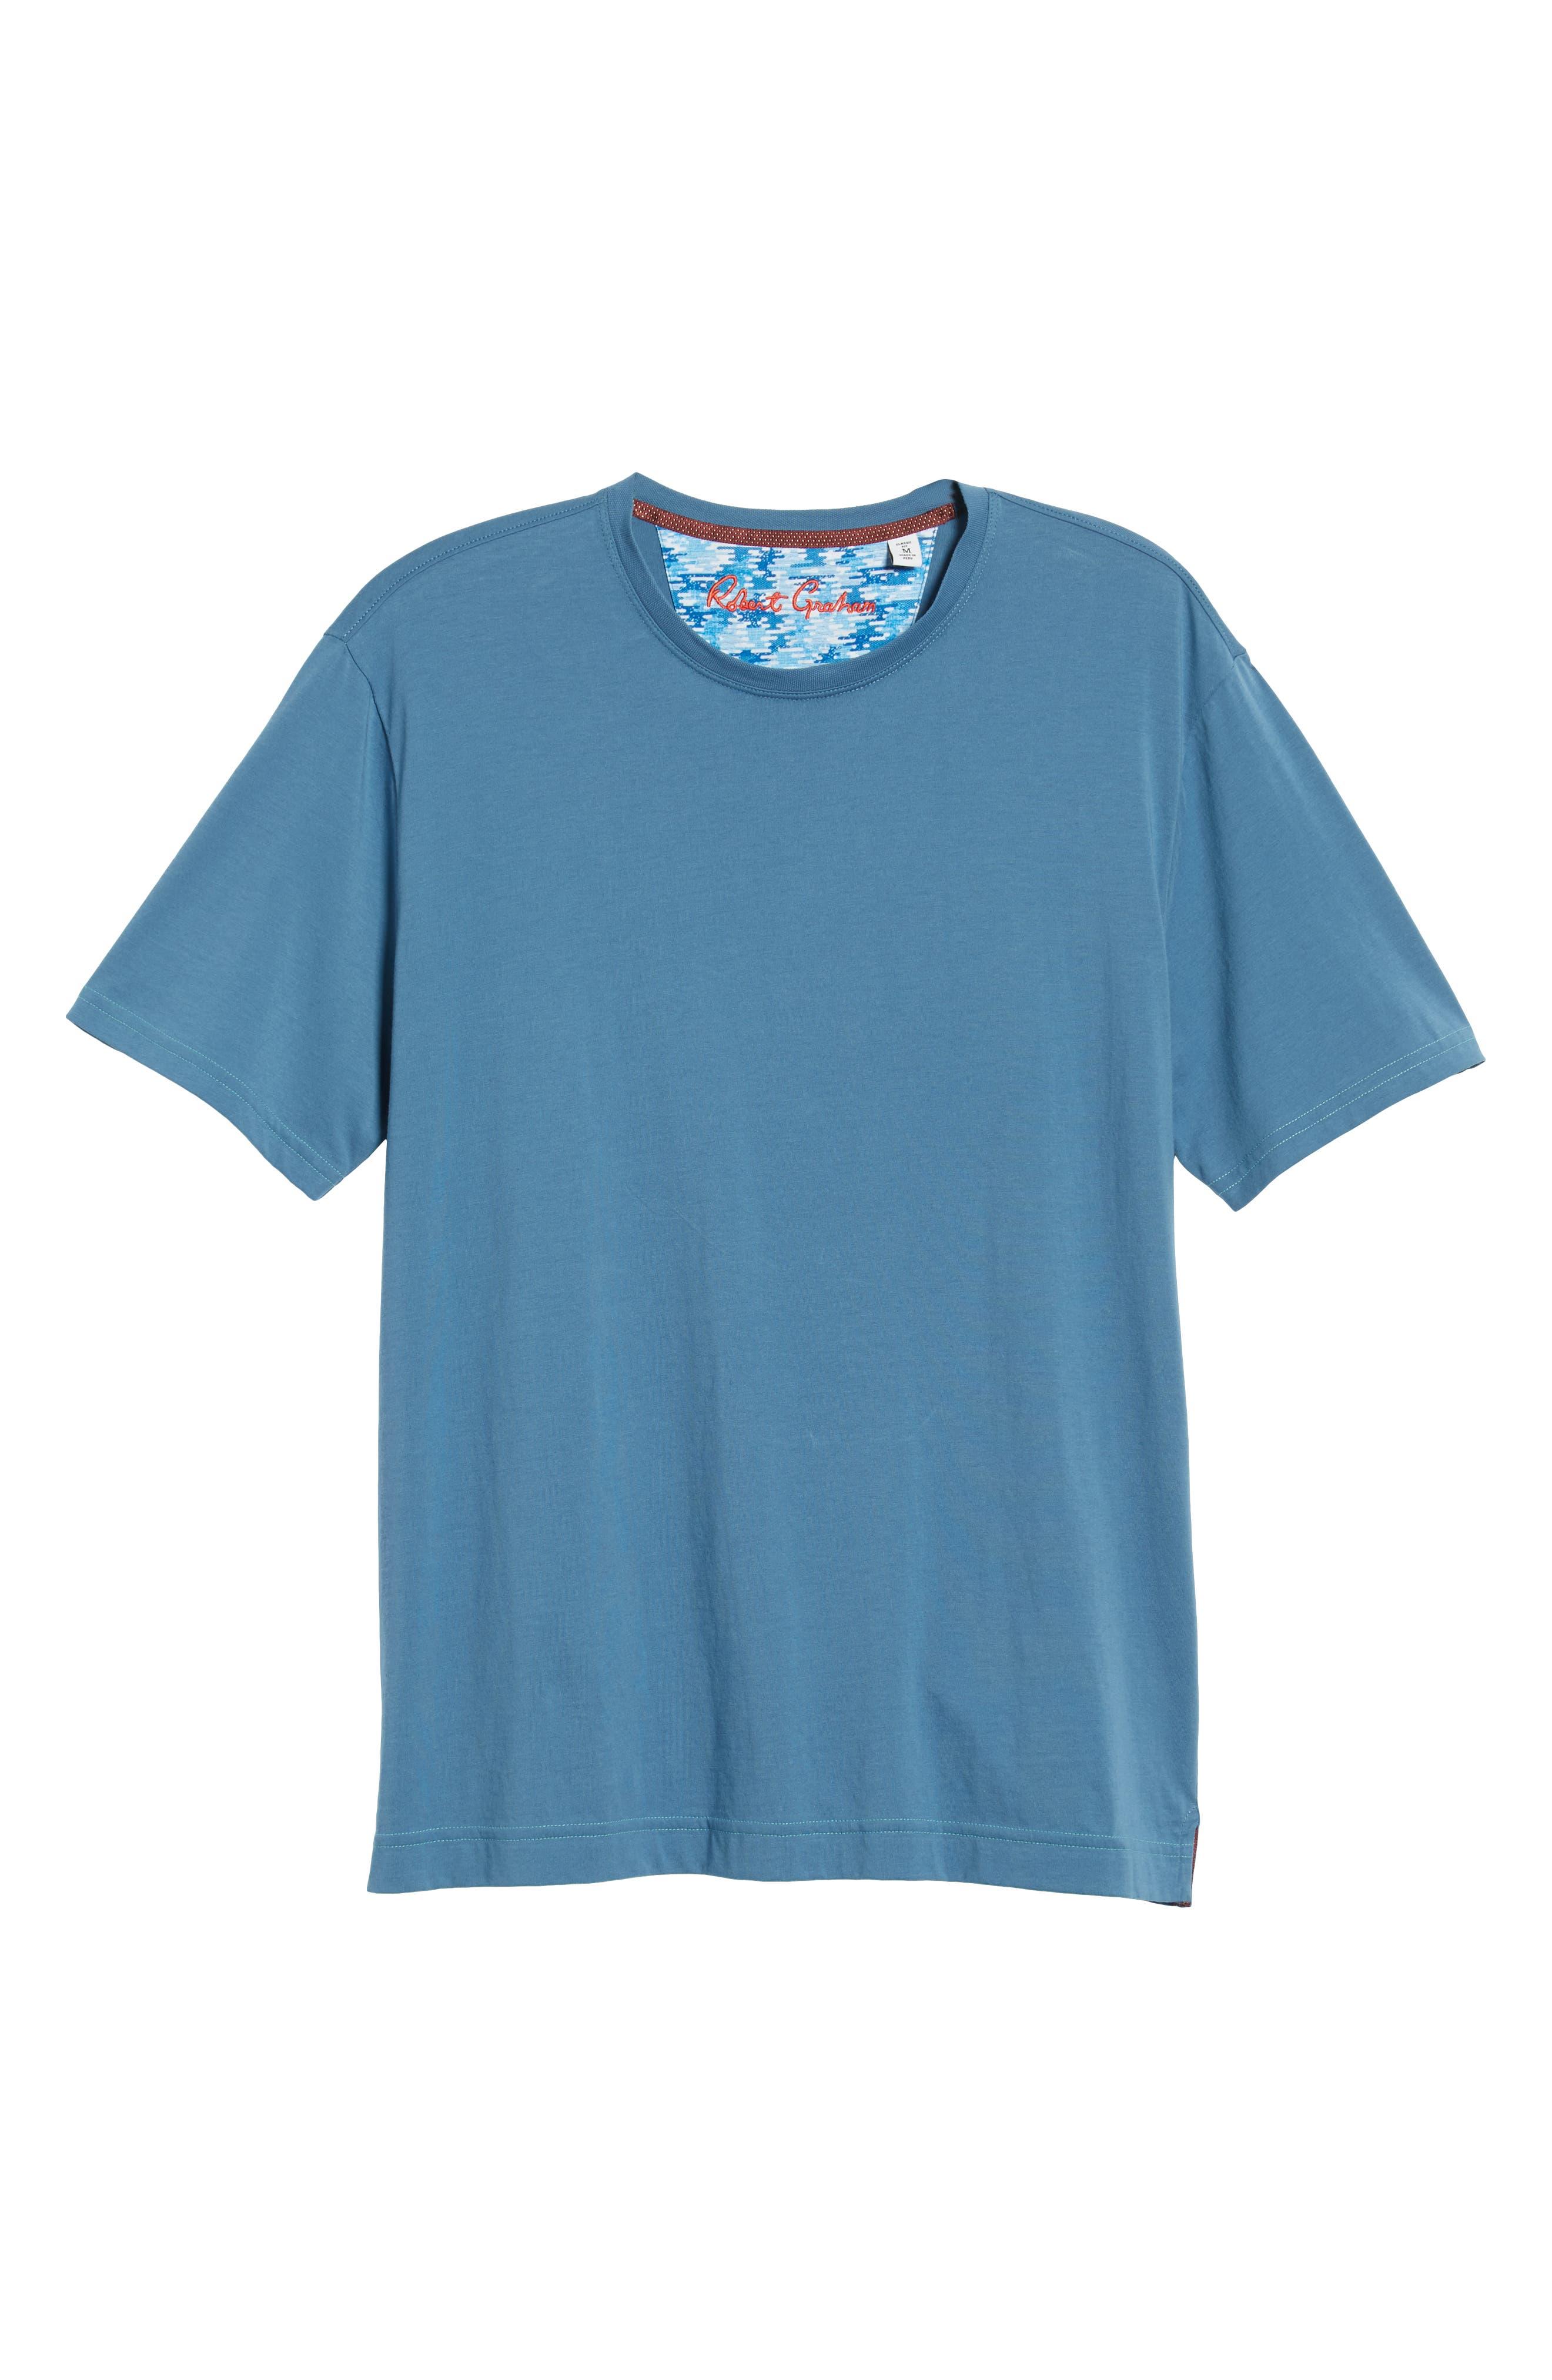 Neo T-Shirt,                             Alternate thumbnail 6, color,                             MARINE